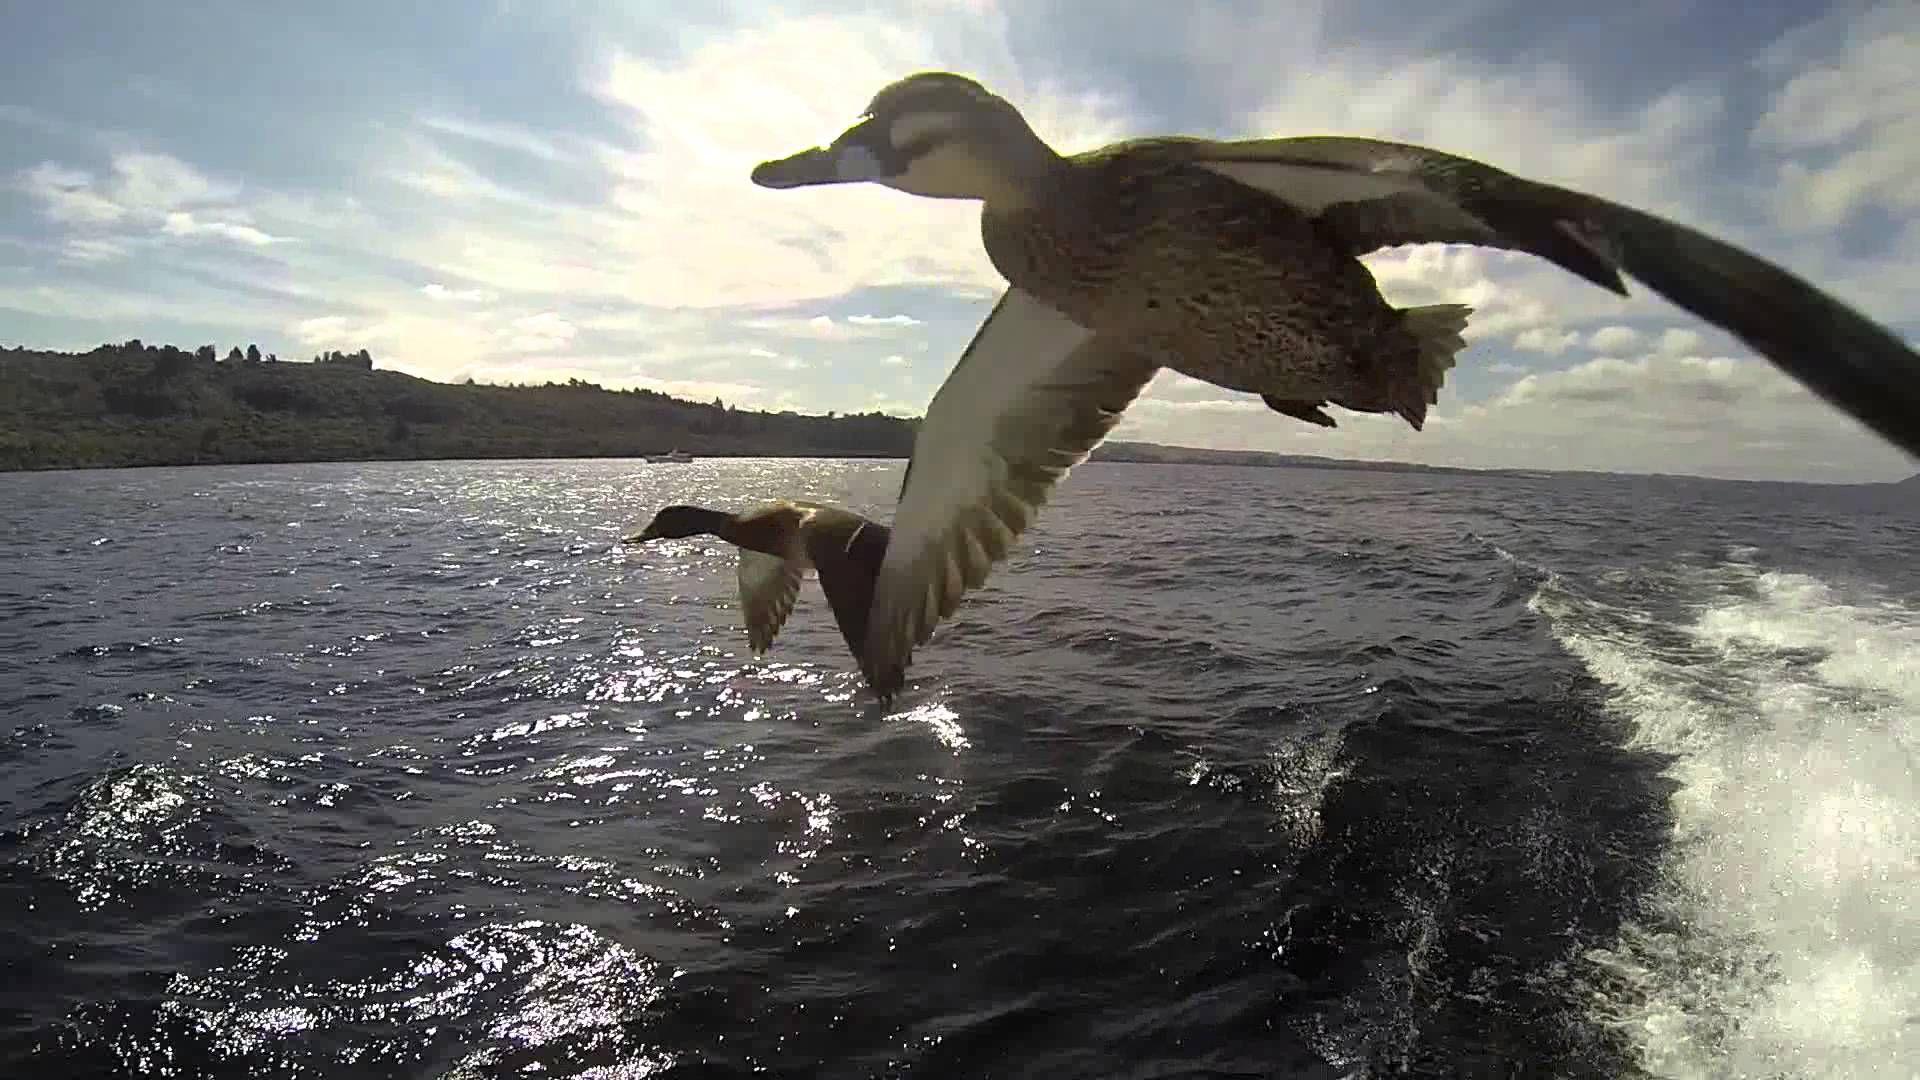 Ducks Flying - HD Wallpaper